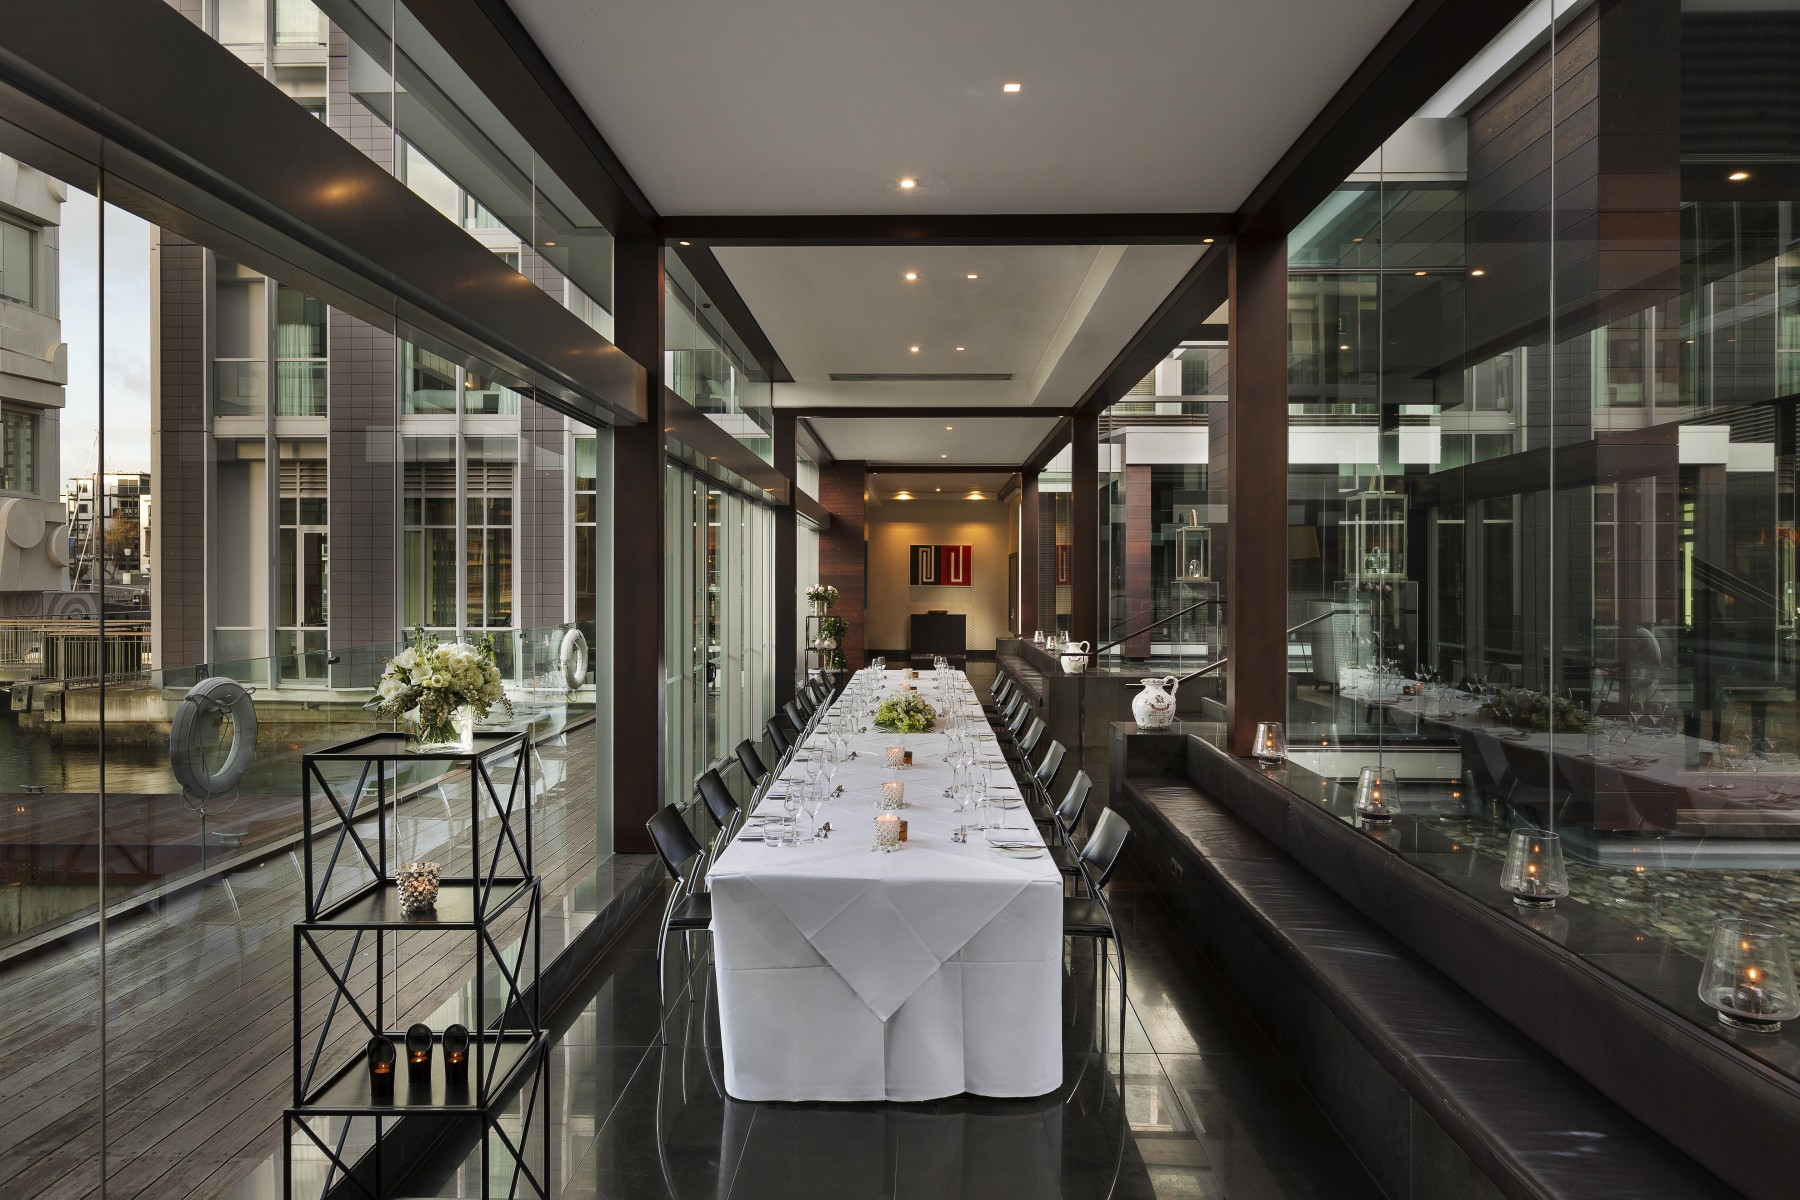 Marina-Terrace-Dinner-Set-up-2MB.jpg